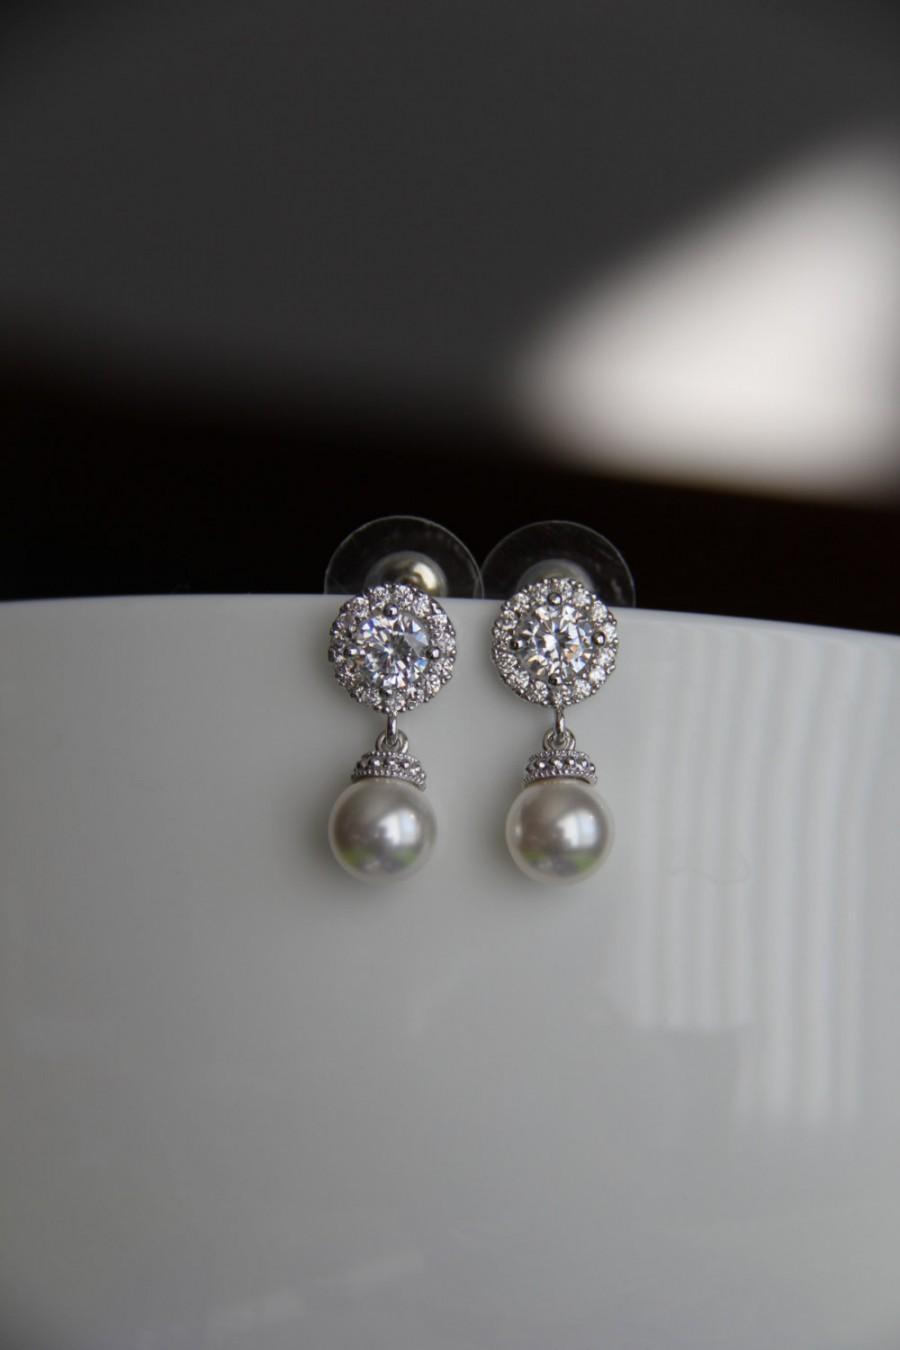 زفاف - Bridal earrings, cz earrings, wedding earrings, bridesmaid earrings, bridal jewelry, wedding jewelry, cz jewelry, dangley earrings